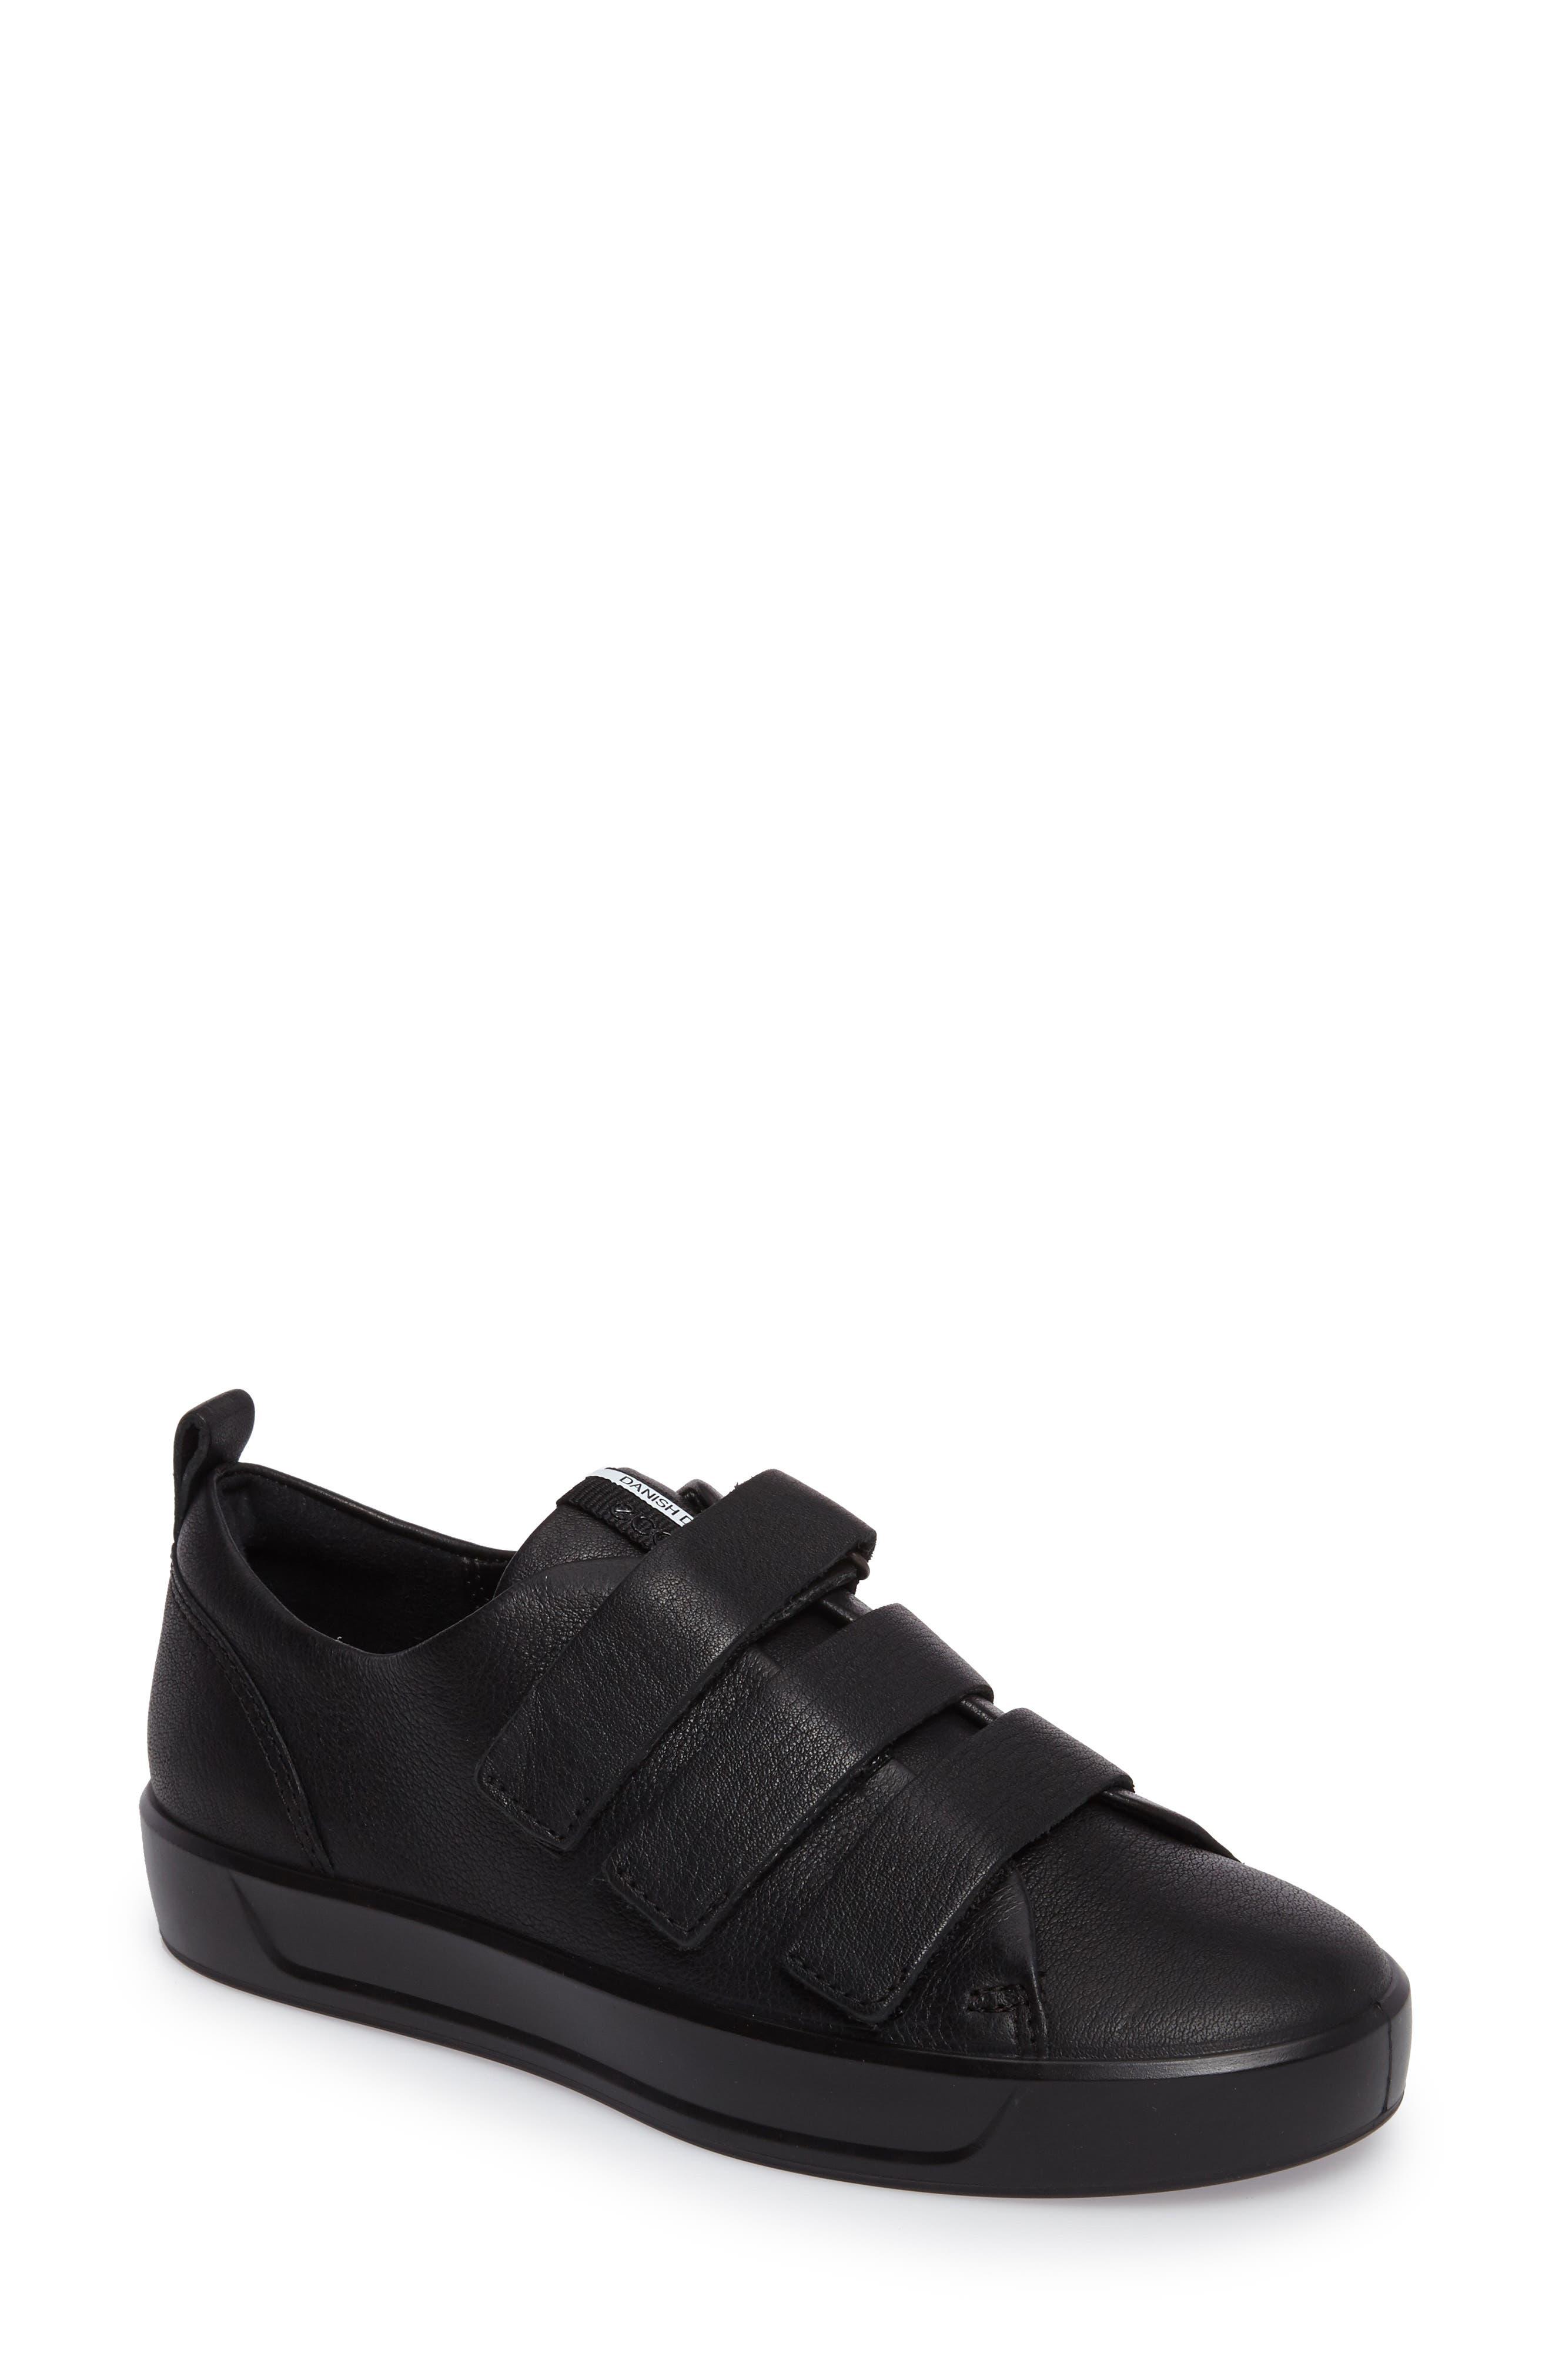 Soft 8 Sneaker,                         Main,                         color, 001